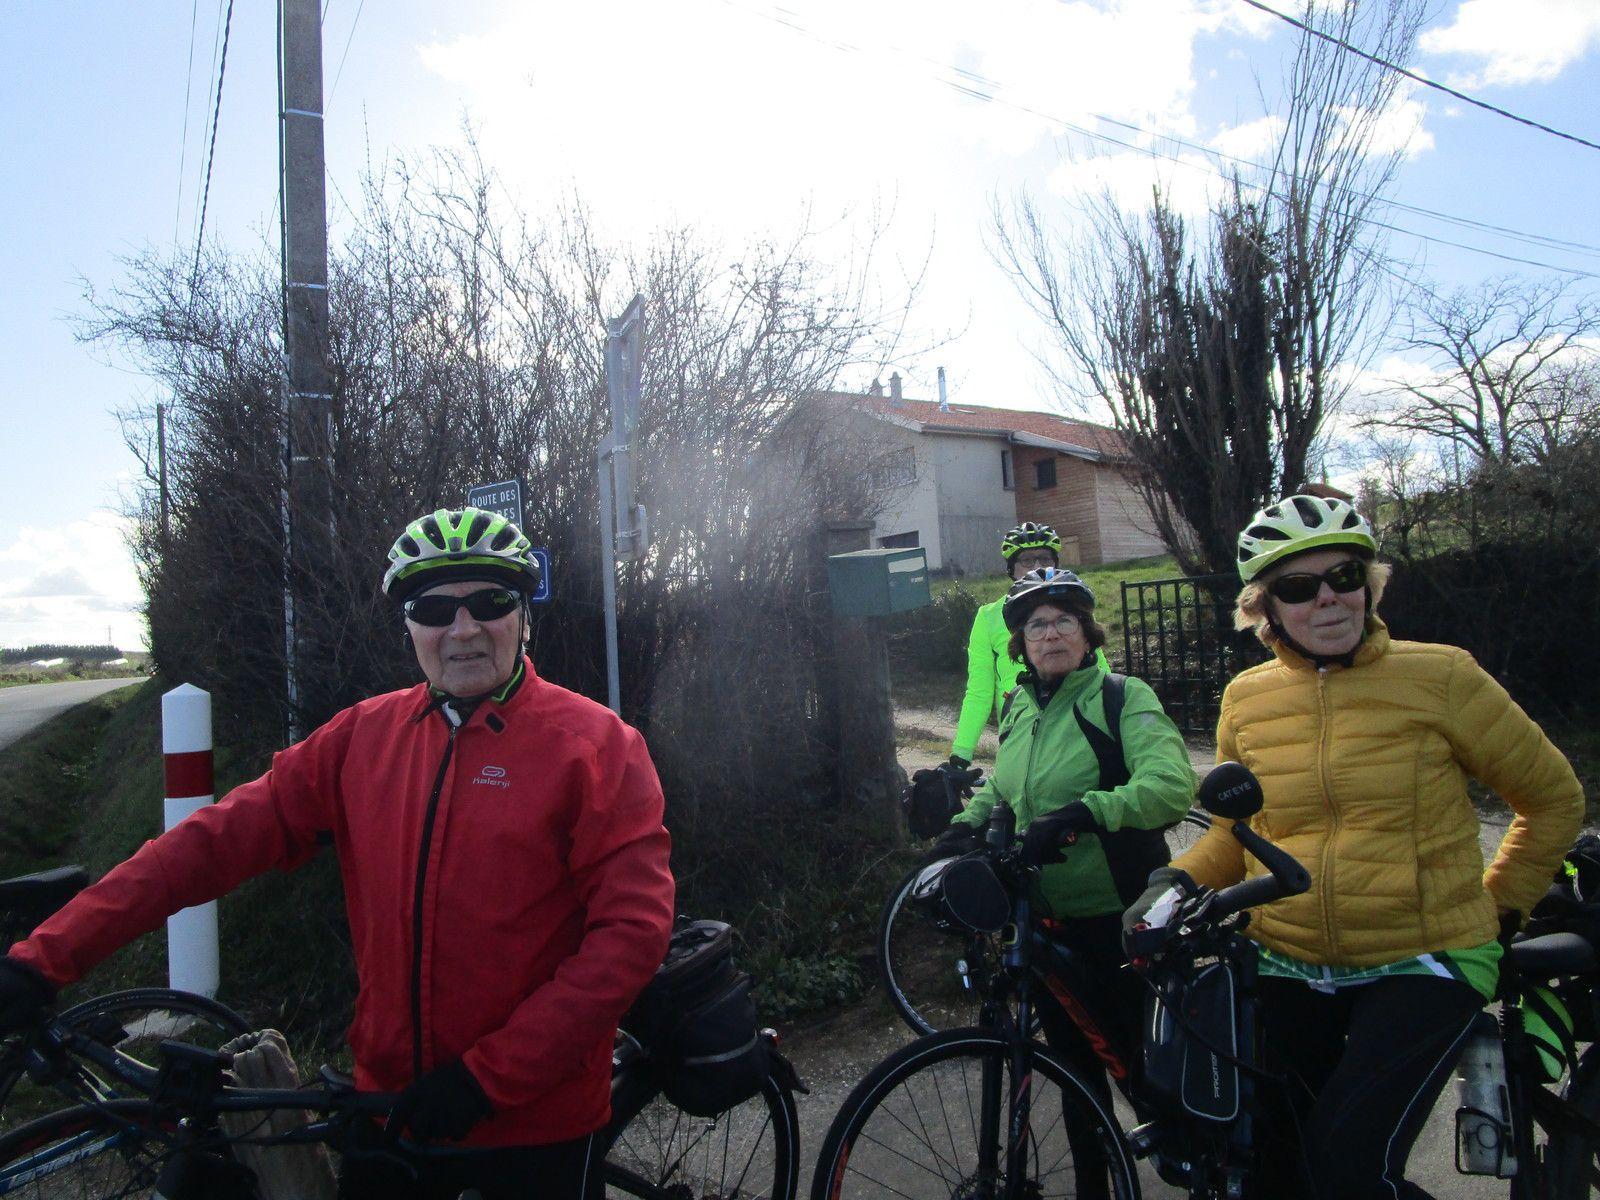 Chaponost -Promeneurs - Mercredi 12 février 2020